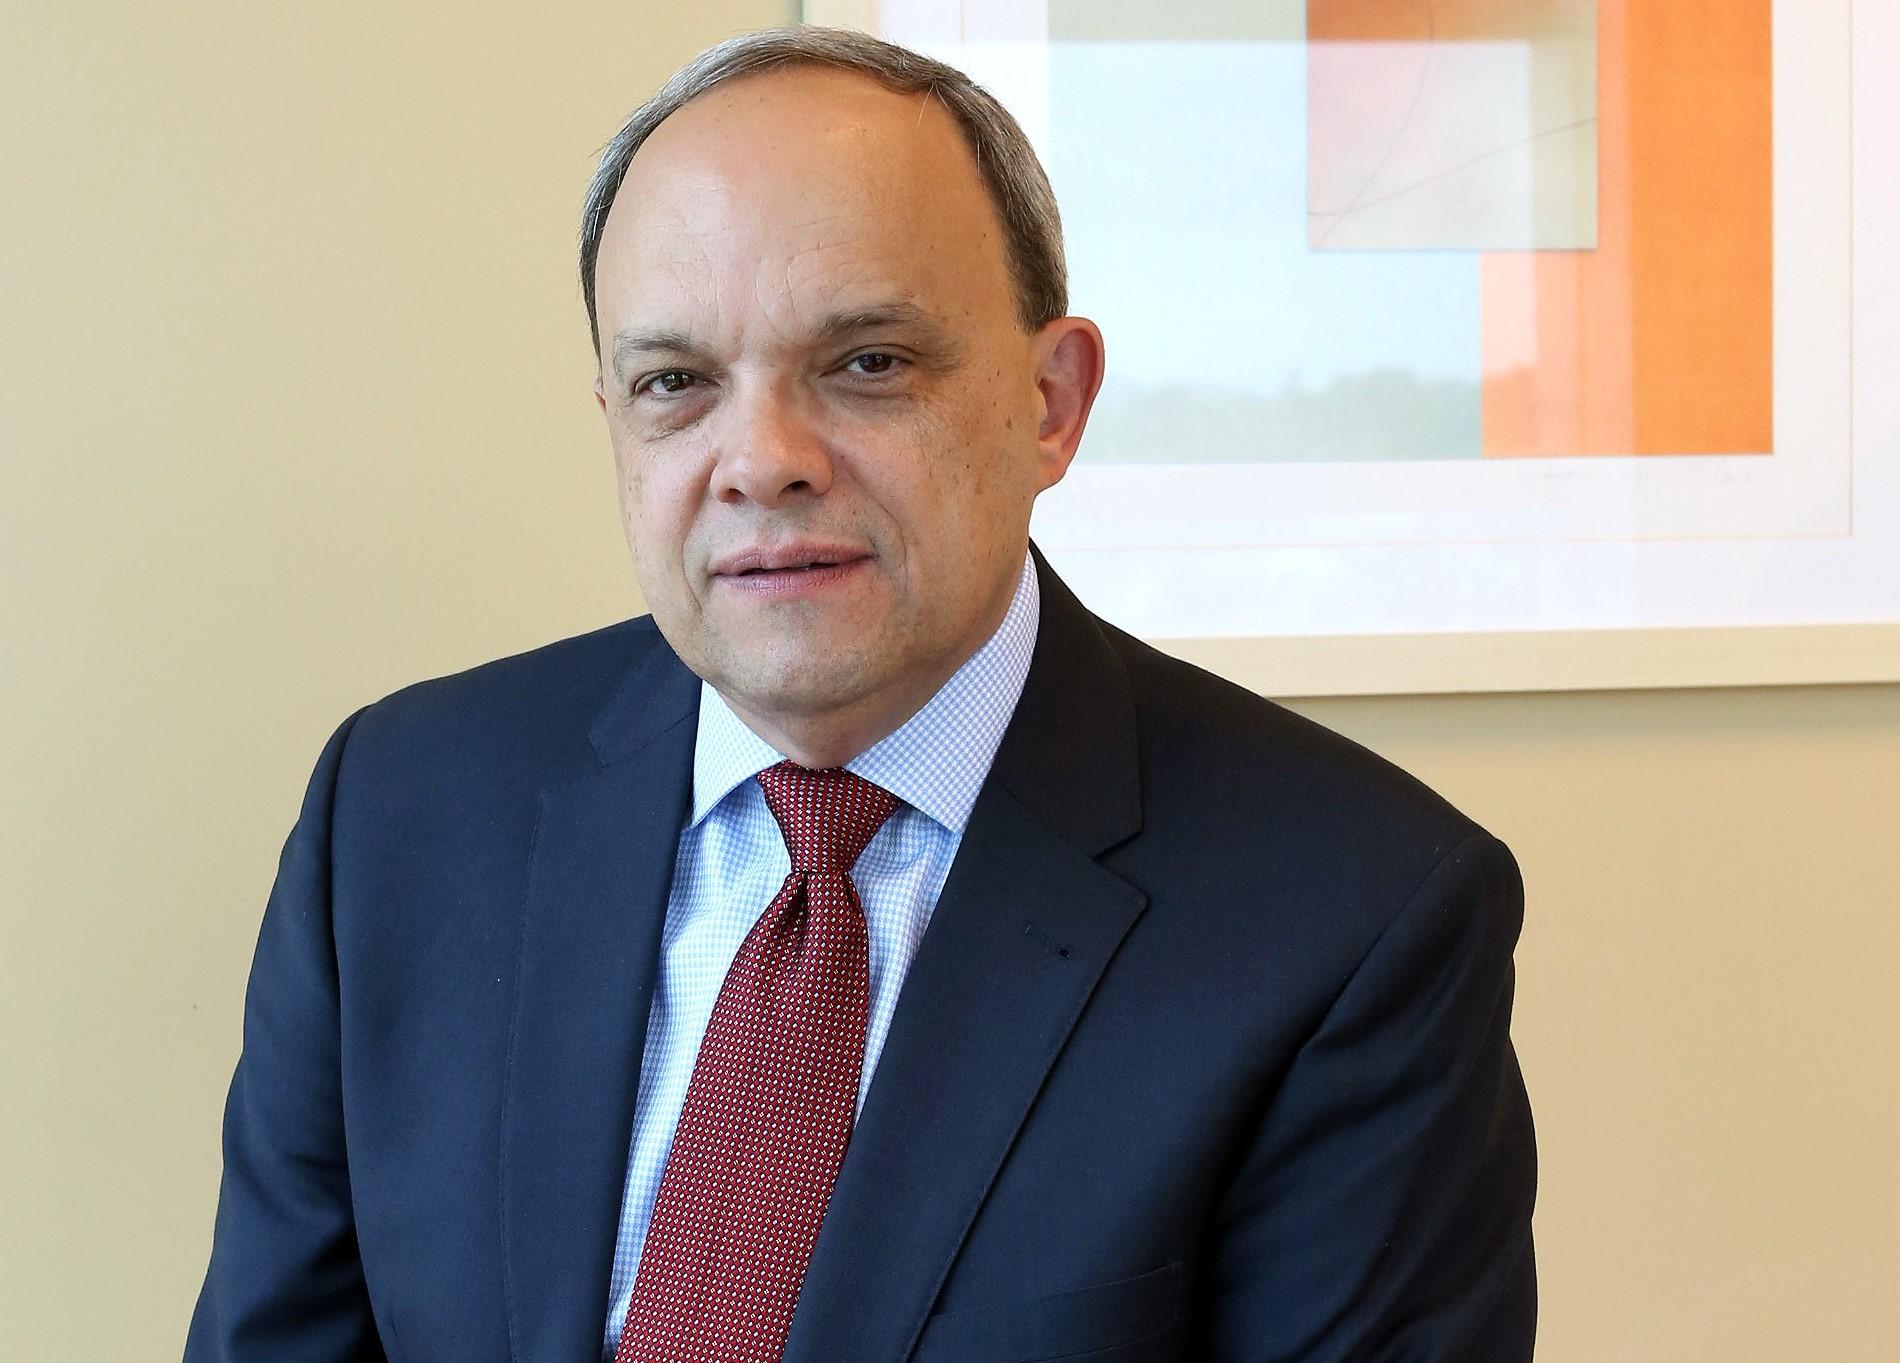 Hélio Samora fala sobre o novo dispositivo de conectividade para ambientes distribuídos